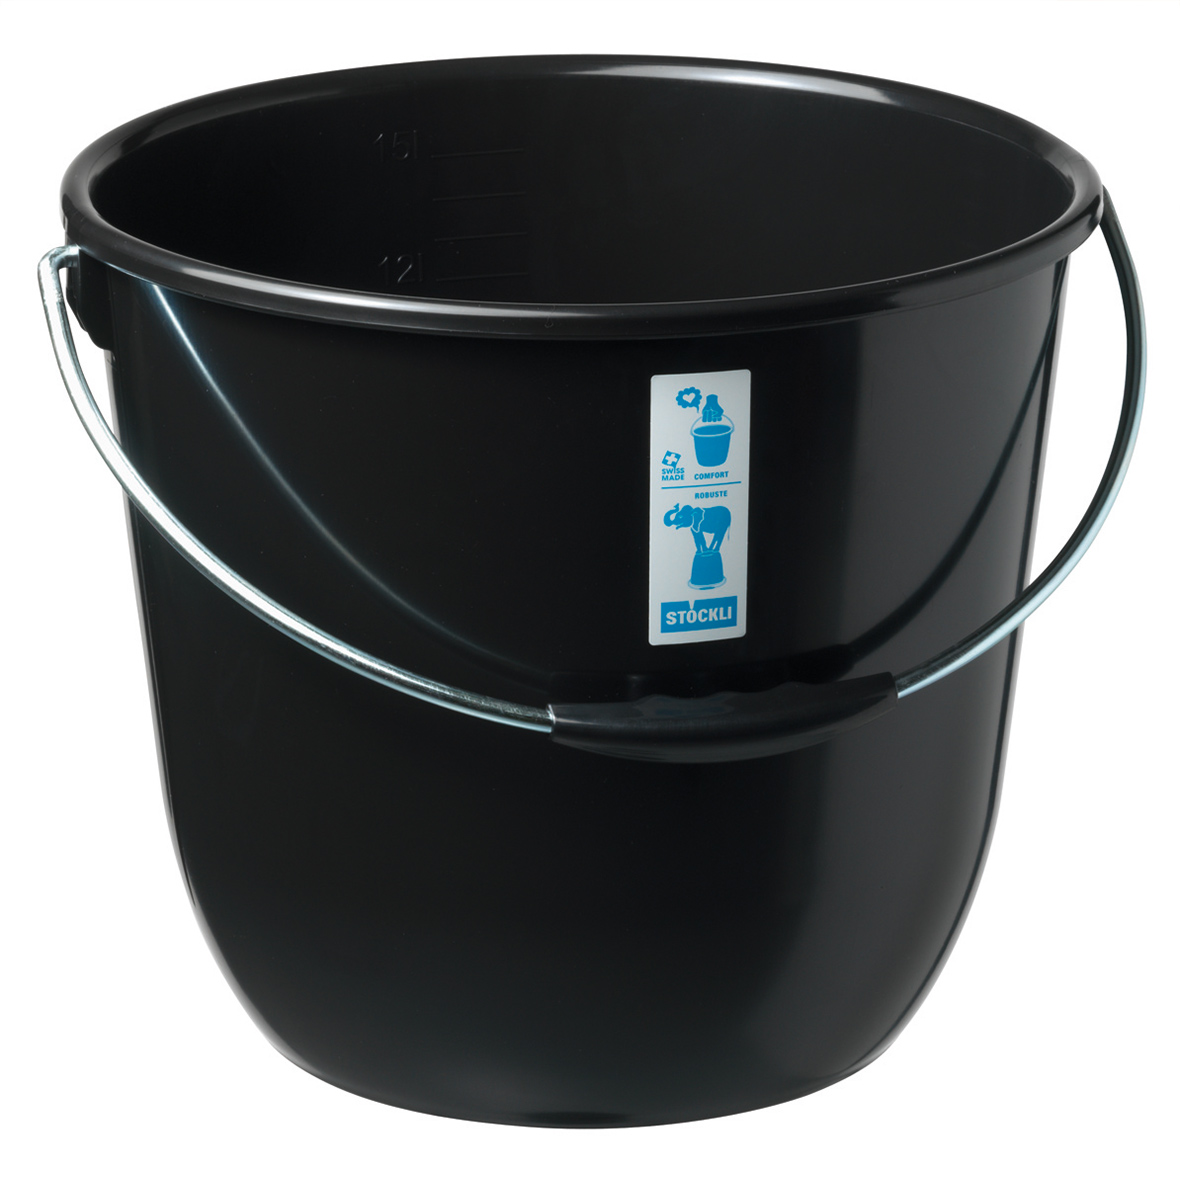 eimer recycling 15 liter bestswiss. Black Bedroom Furniture Sets. Home Design Ideas